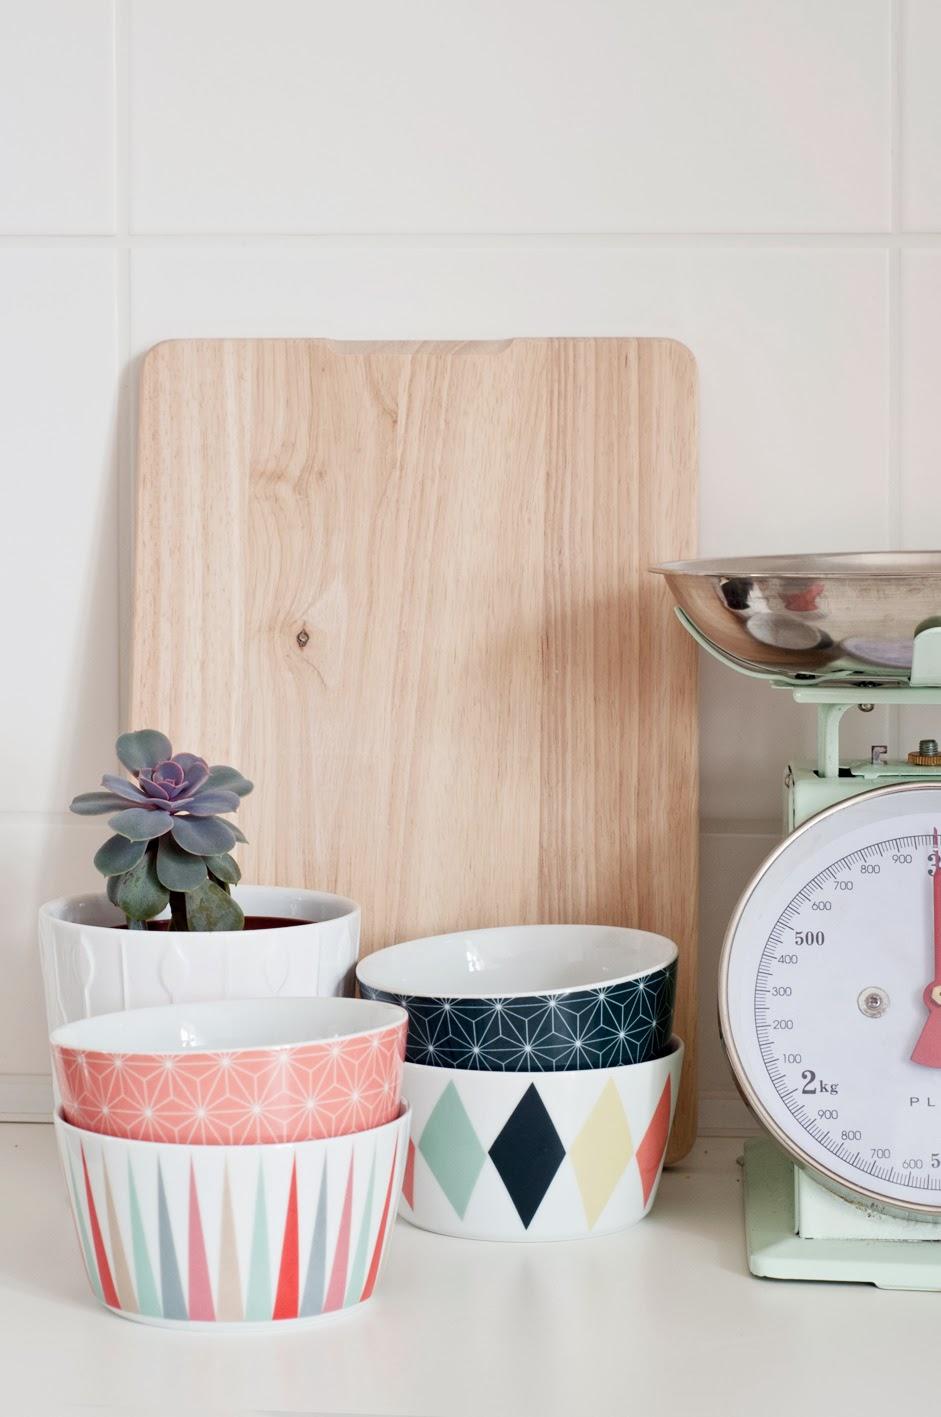 mis favoritos de la nueva colecci n ikea brakig colgadadeunapercha. Black Bedroom Furniture Sets. Home Design Ideas